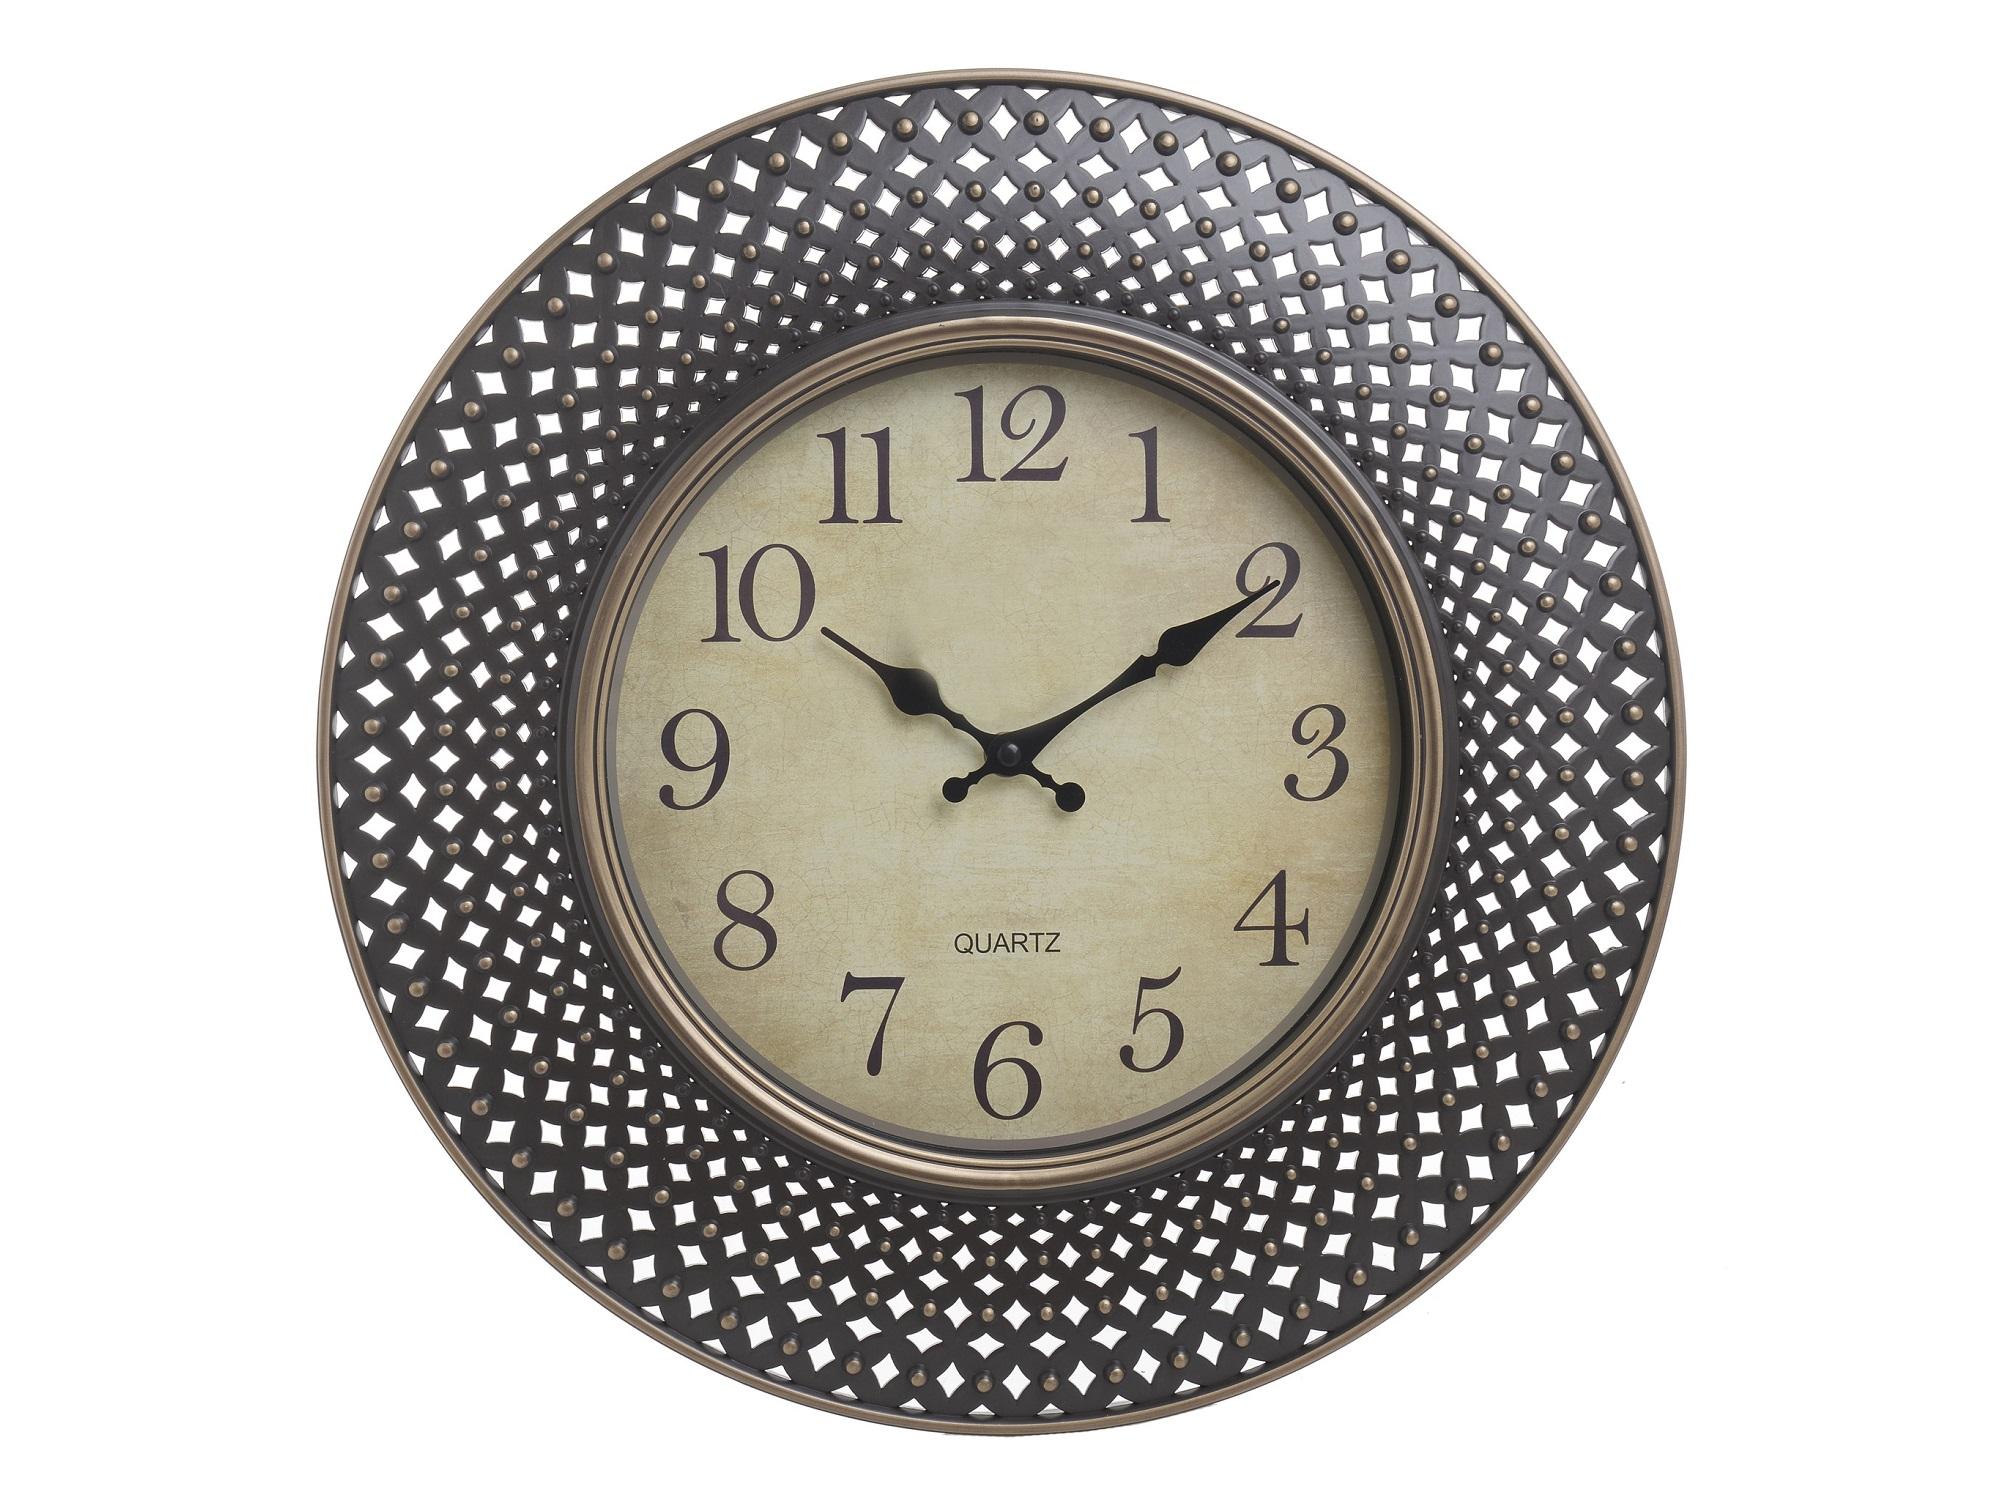 Часы настенные MessiahНастенные часы<br>Кварцевый механизм<br><br>Material: Полистоун<br>Глубина см: 3.5